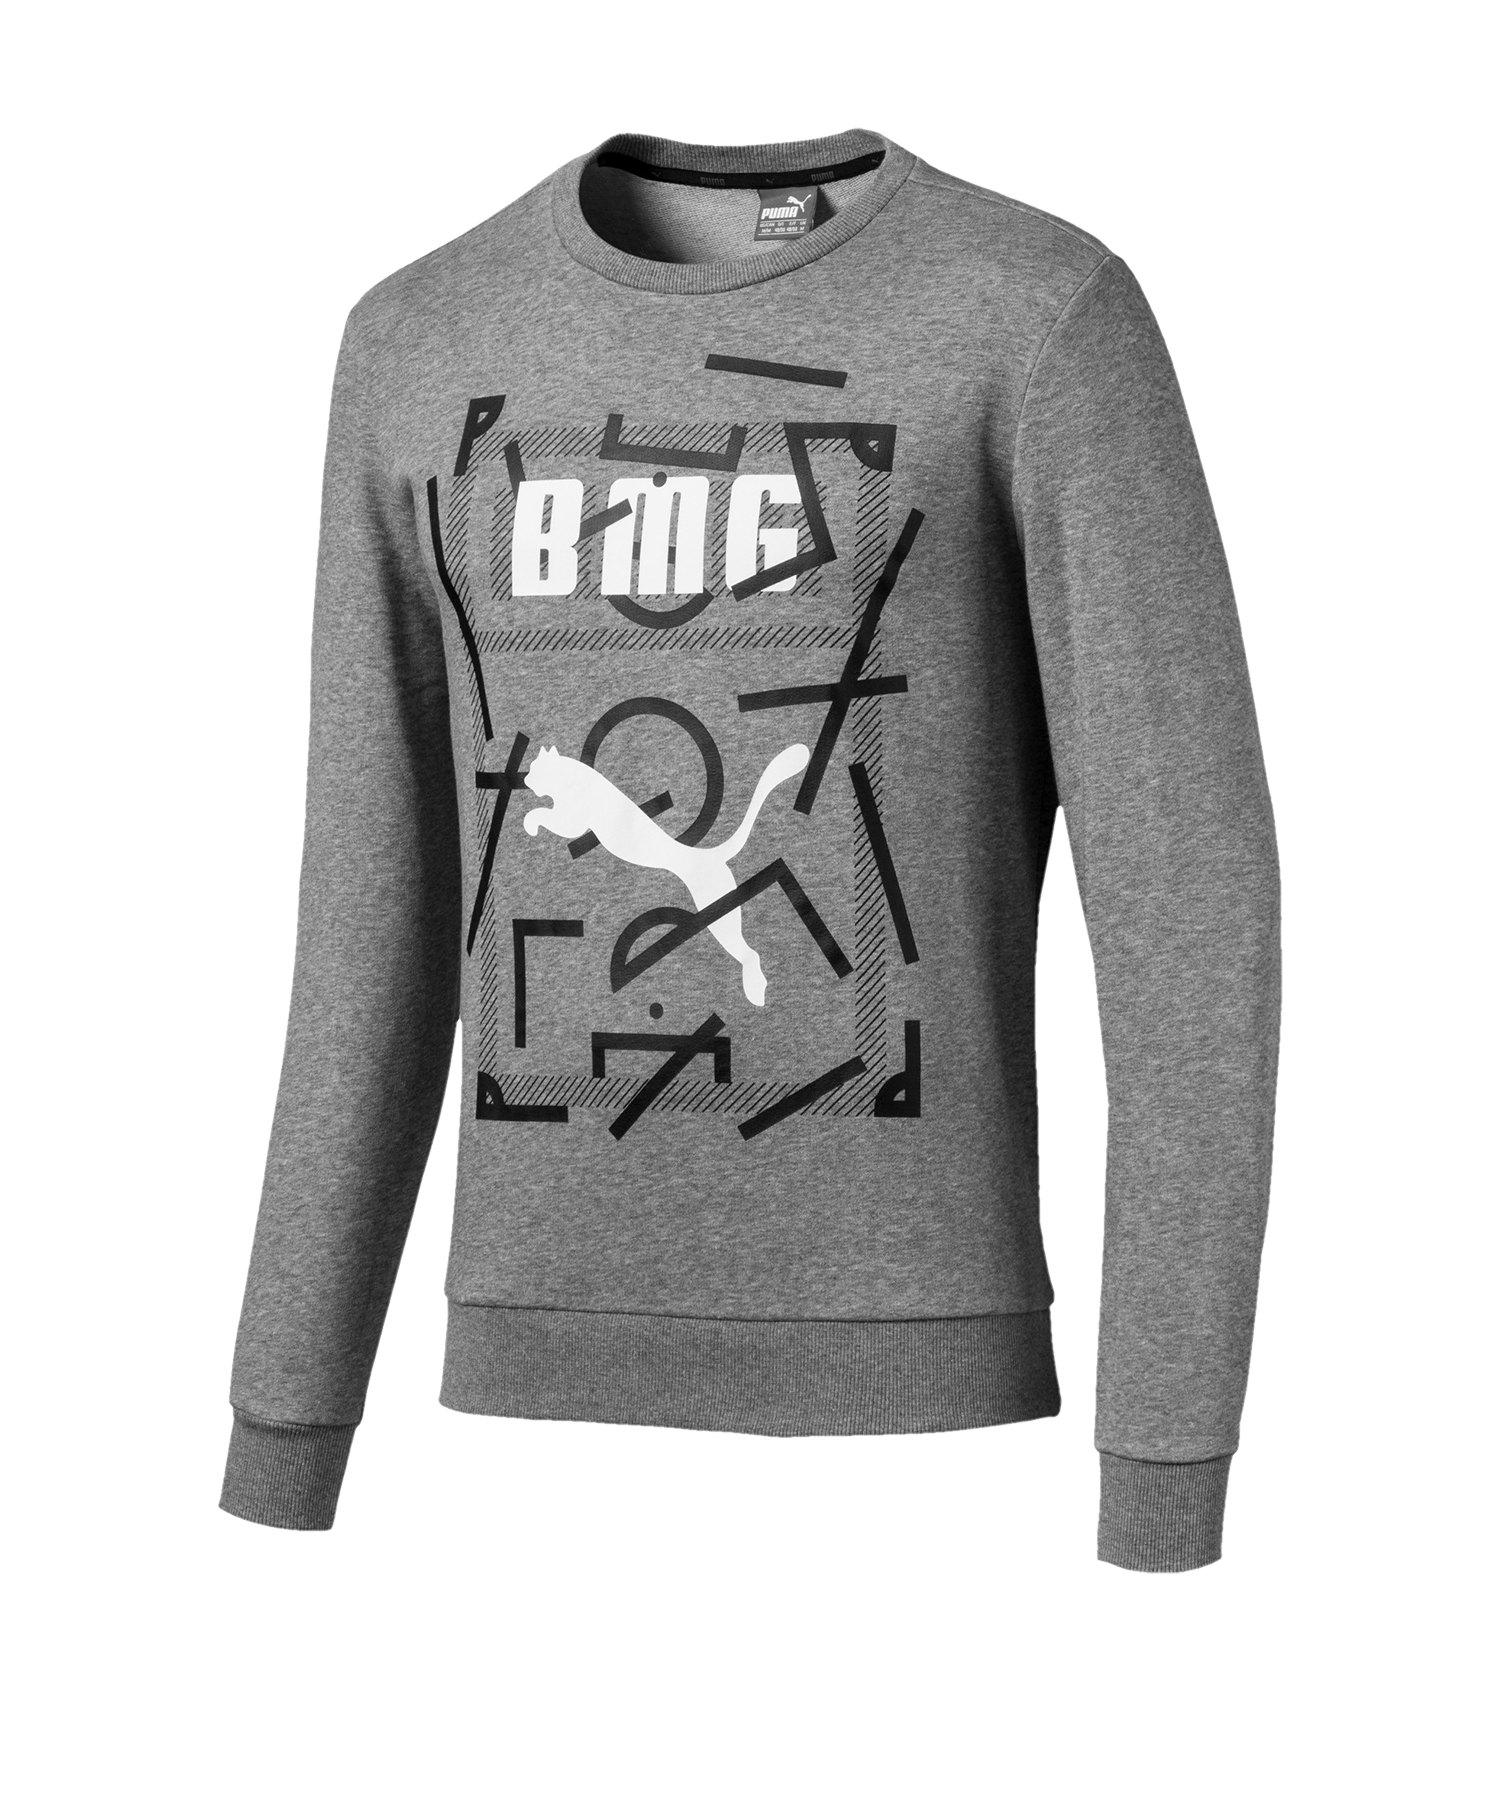 PUMA Borussia Mönchengladbach DNA Sweater F15 - Grau